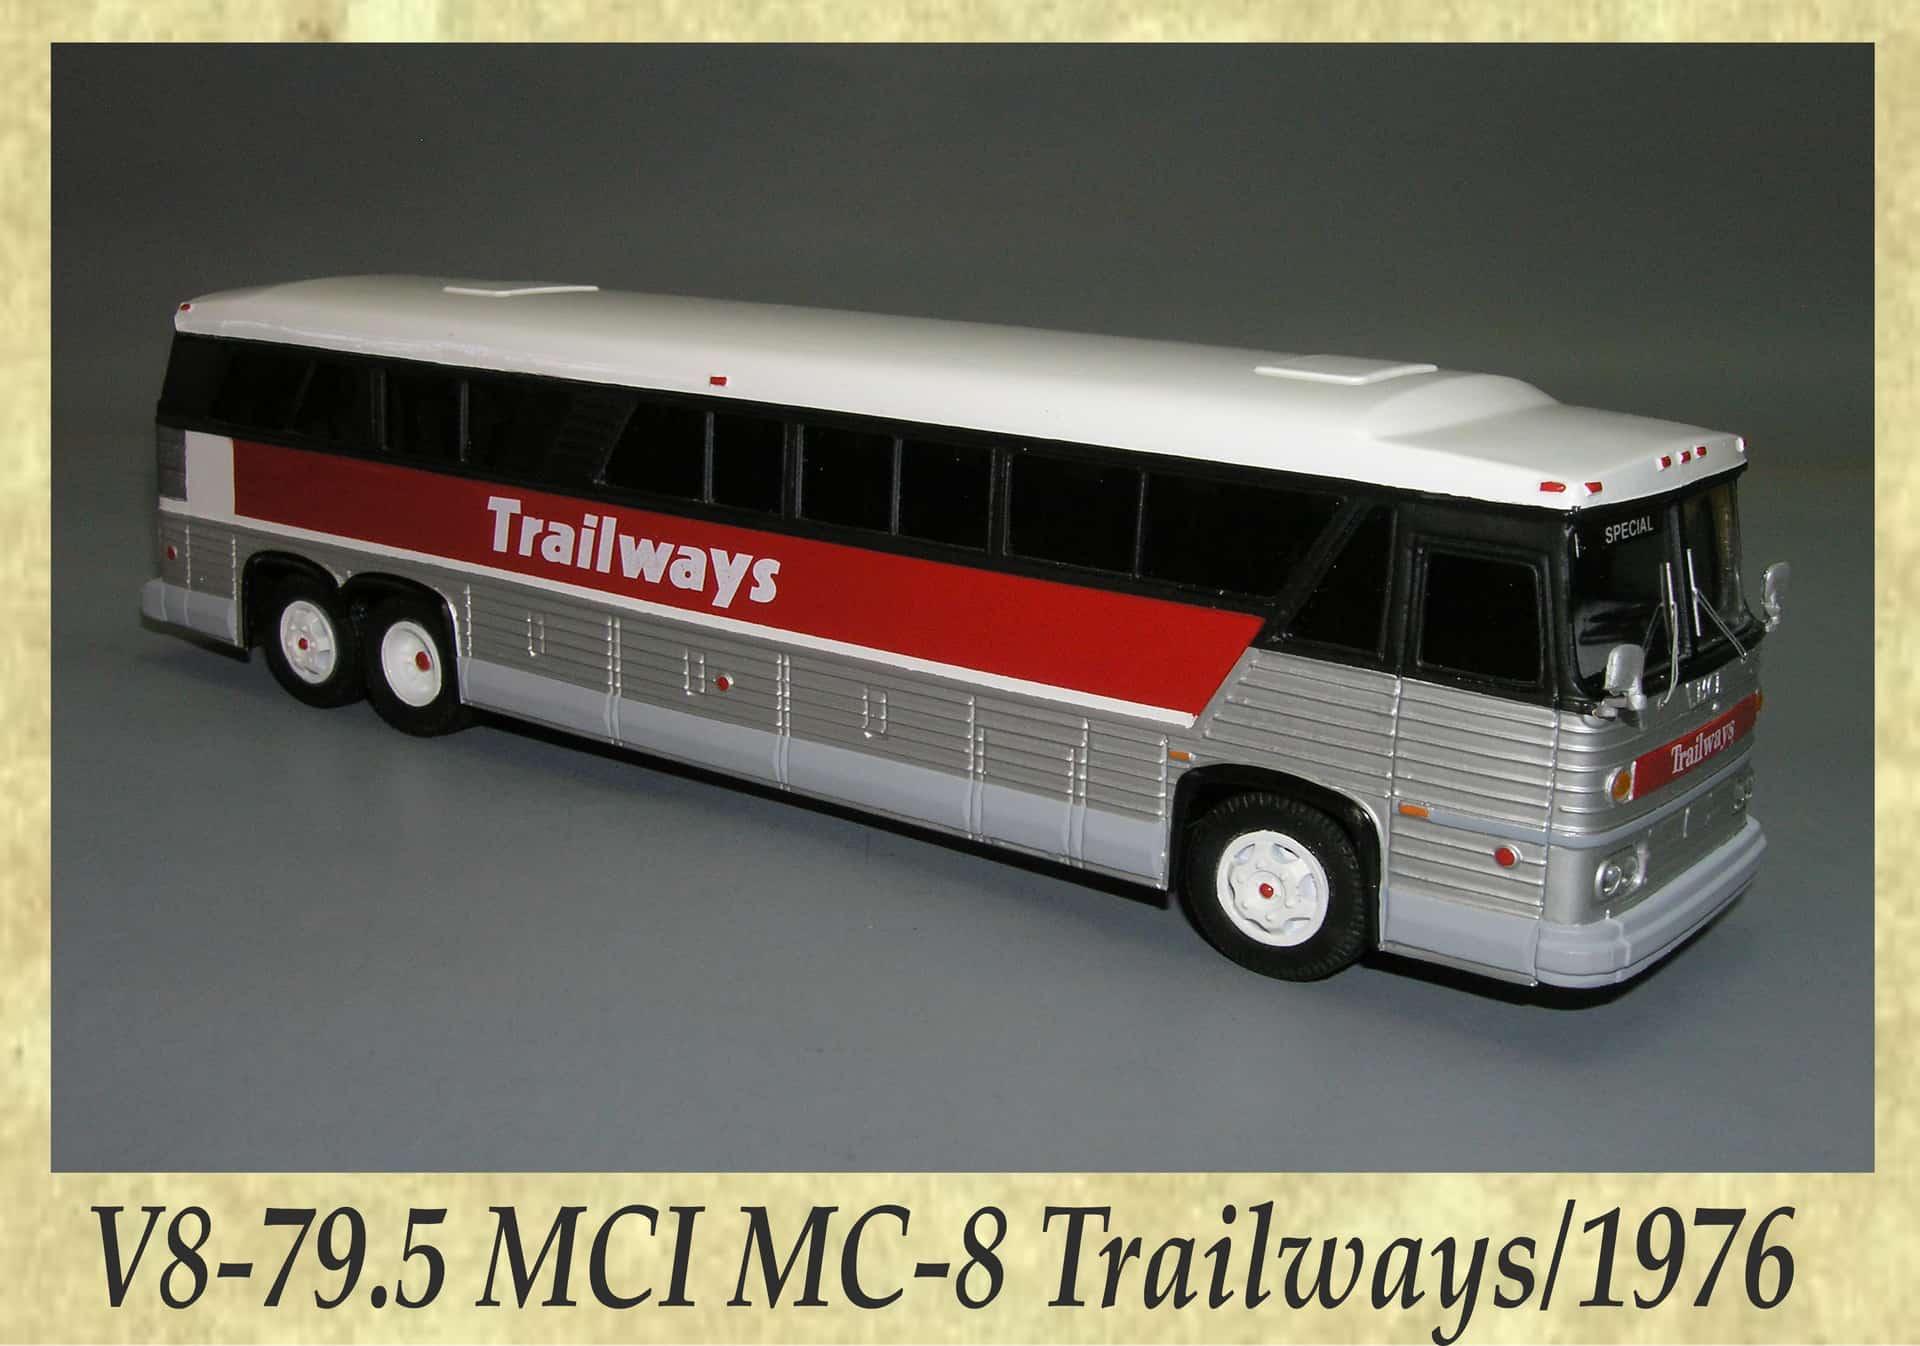 V8-79.5 MCI MC-8 Trailways 1976